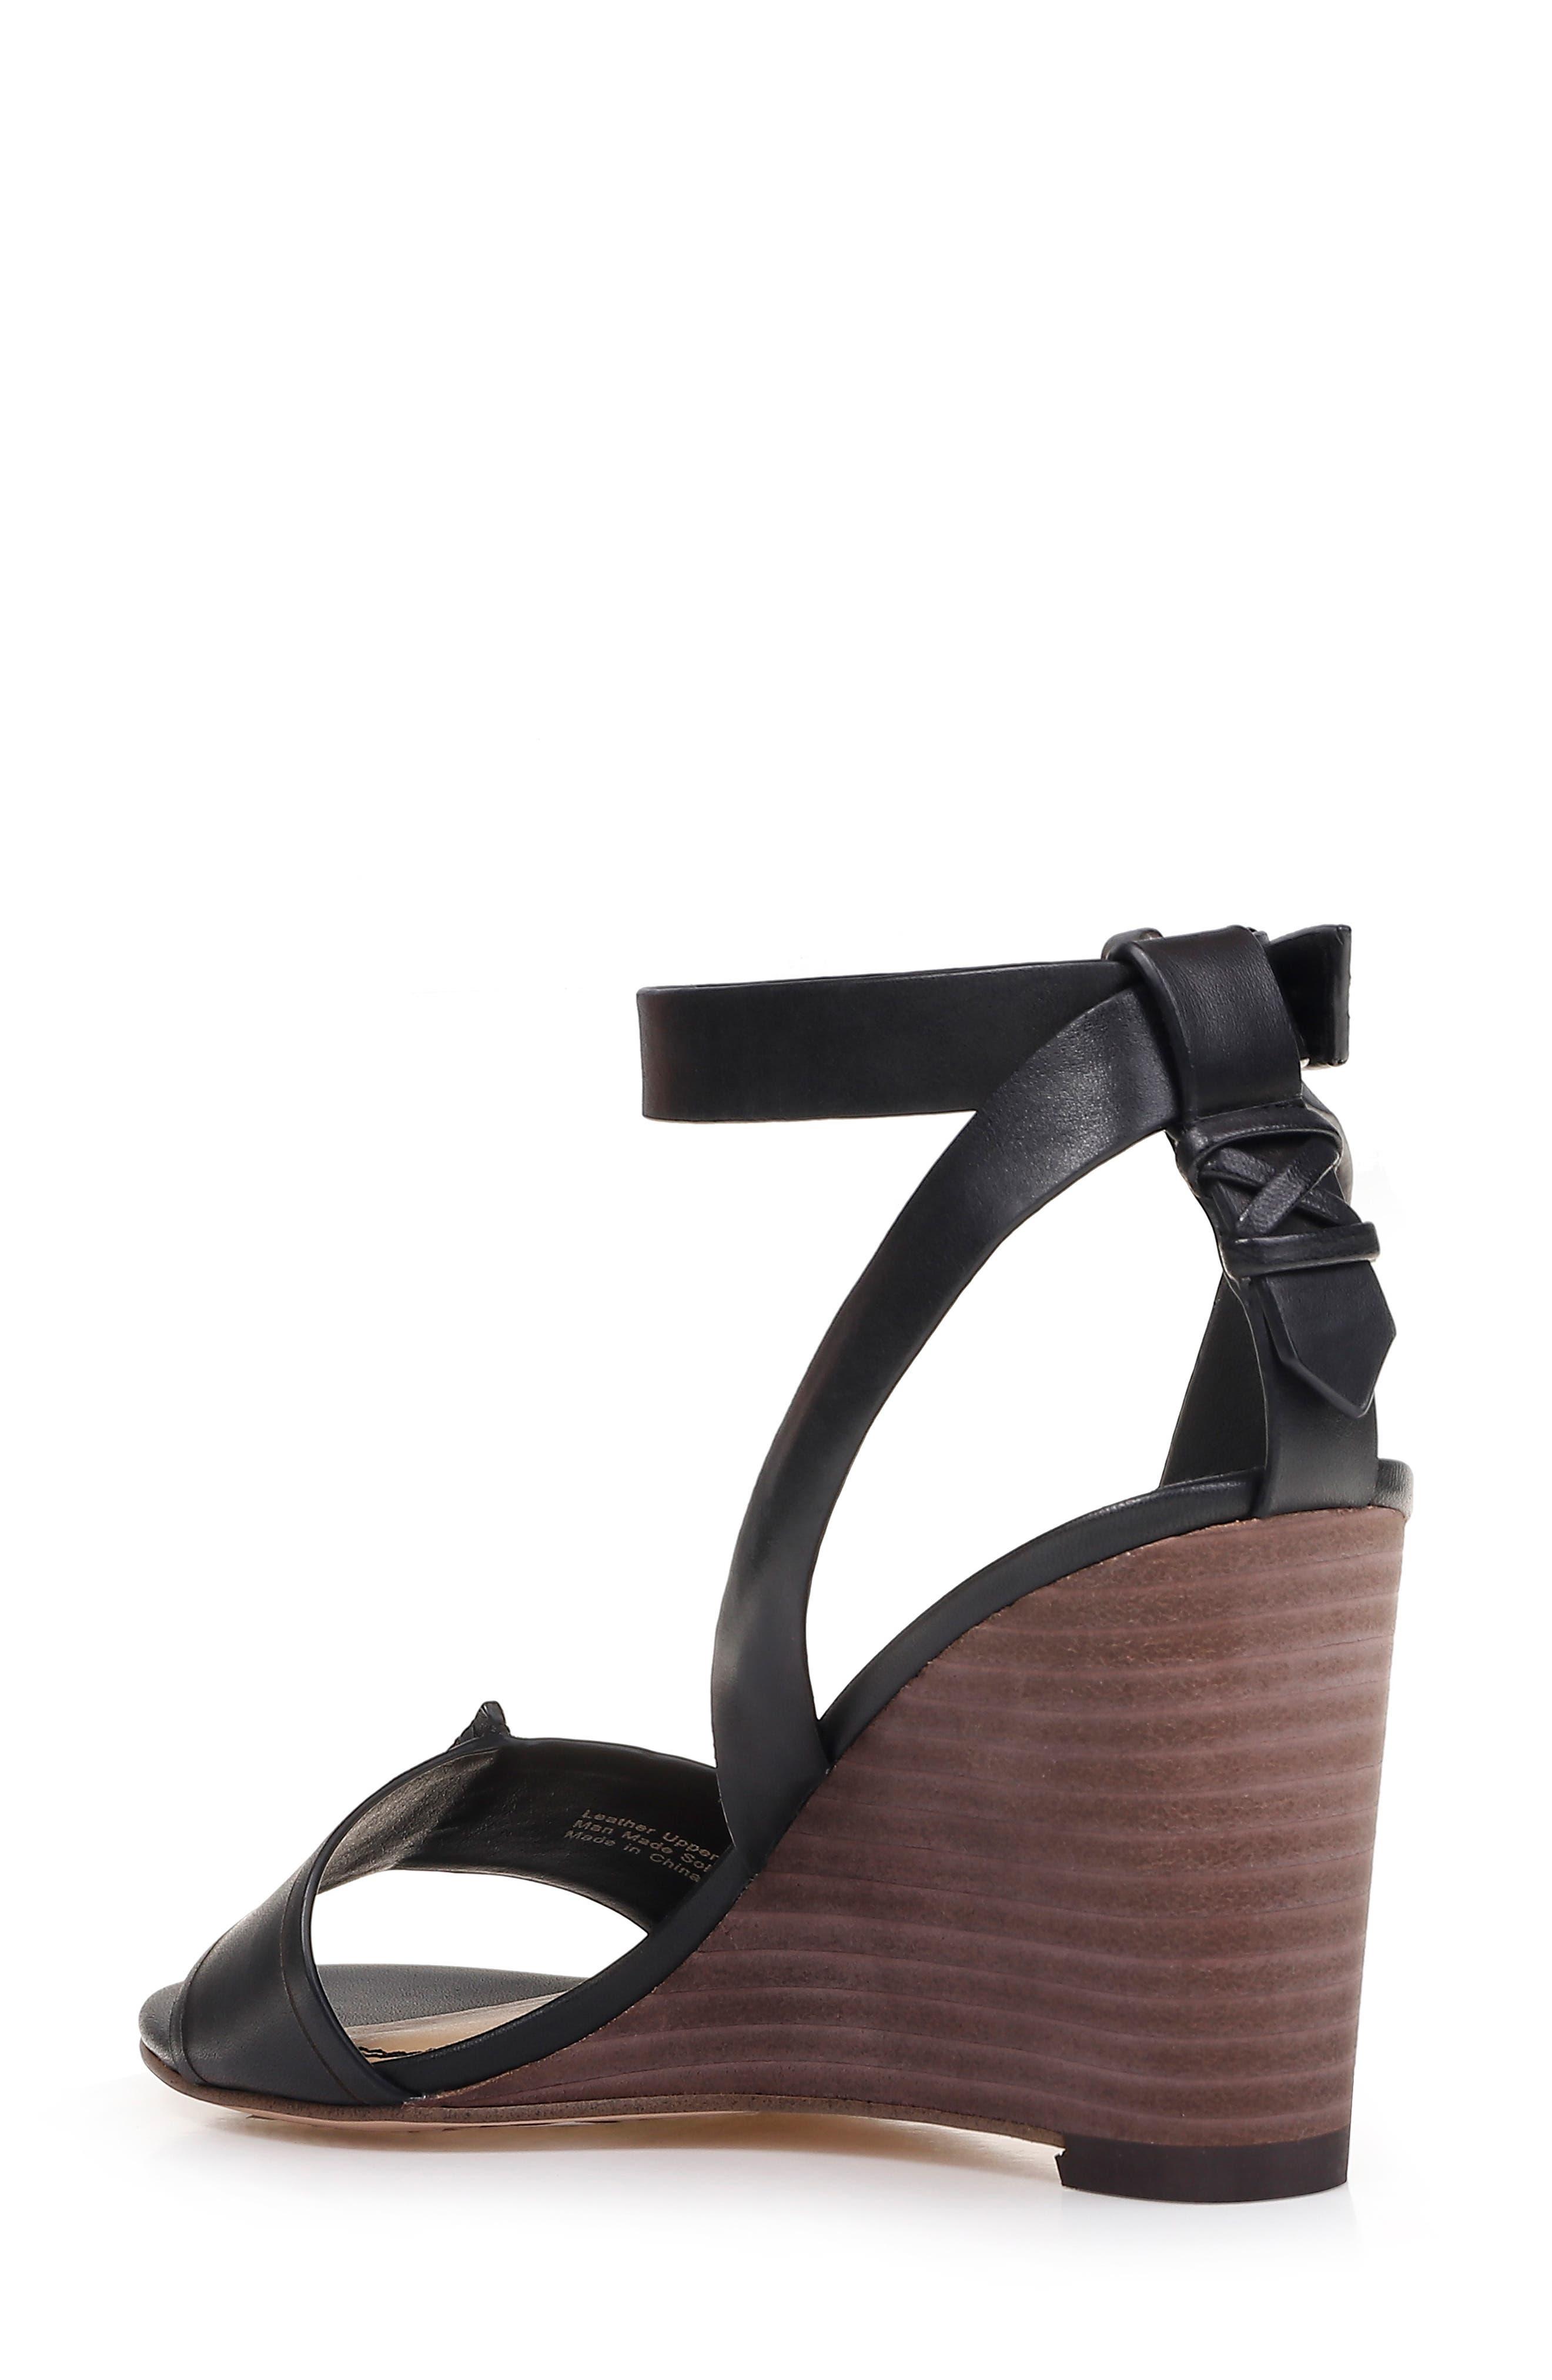 SPLENDID, Tadeo Wedge Ankle Strap Sandal, Alternate thumbnail 2, color, BLACK LEATHER